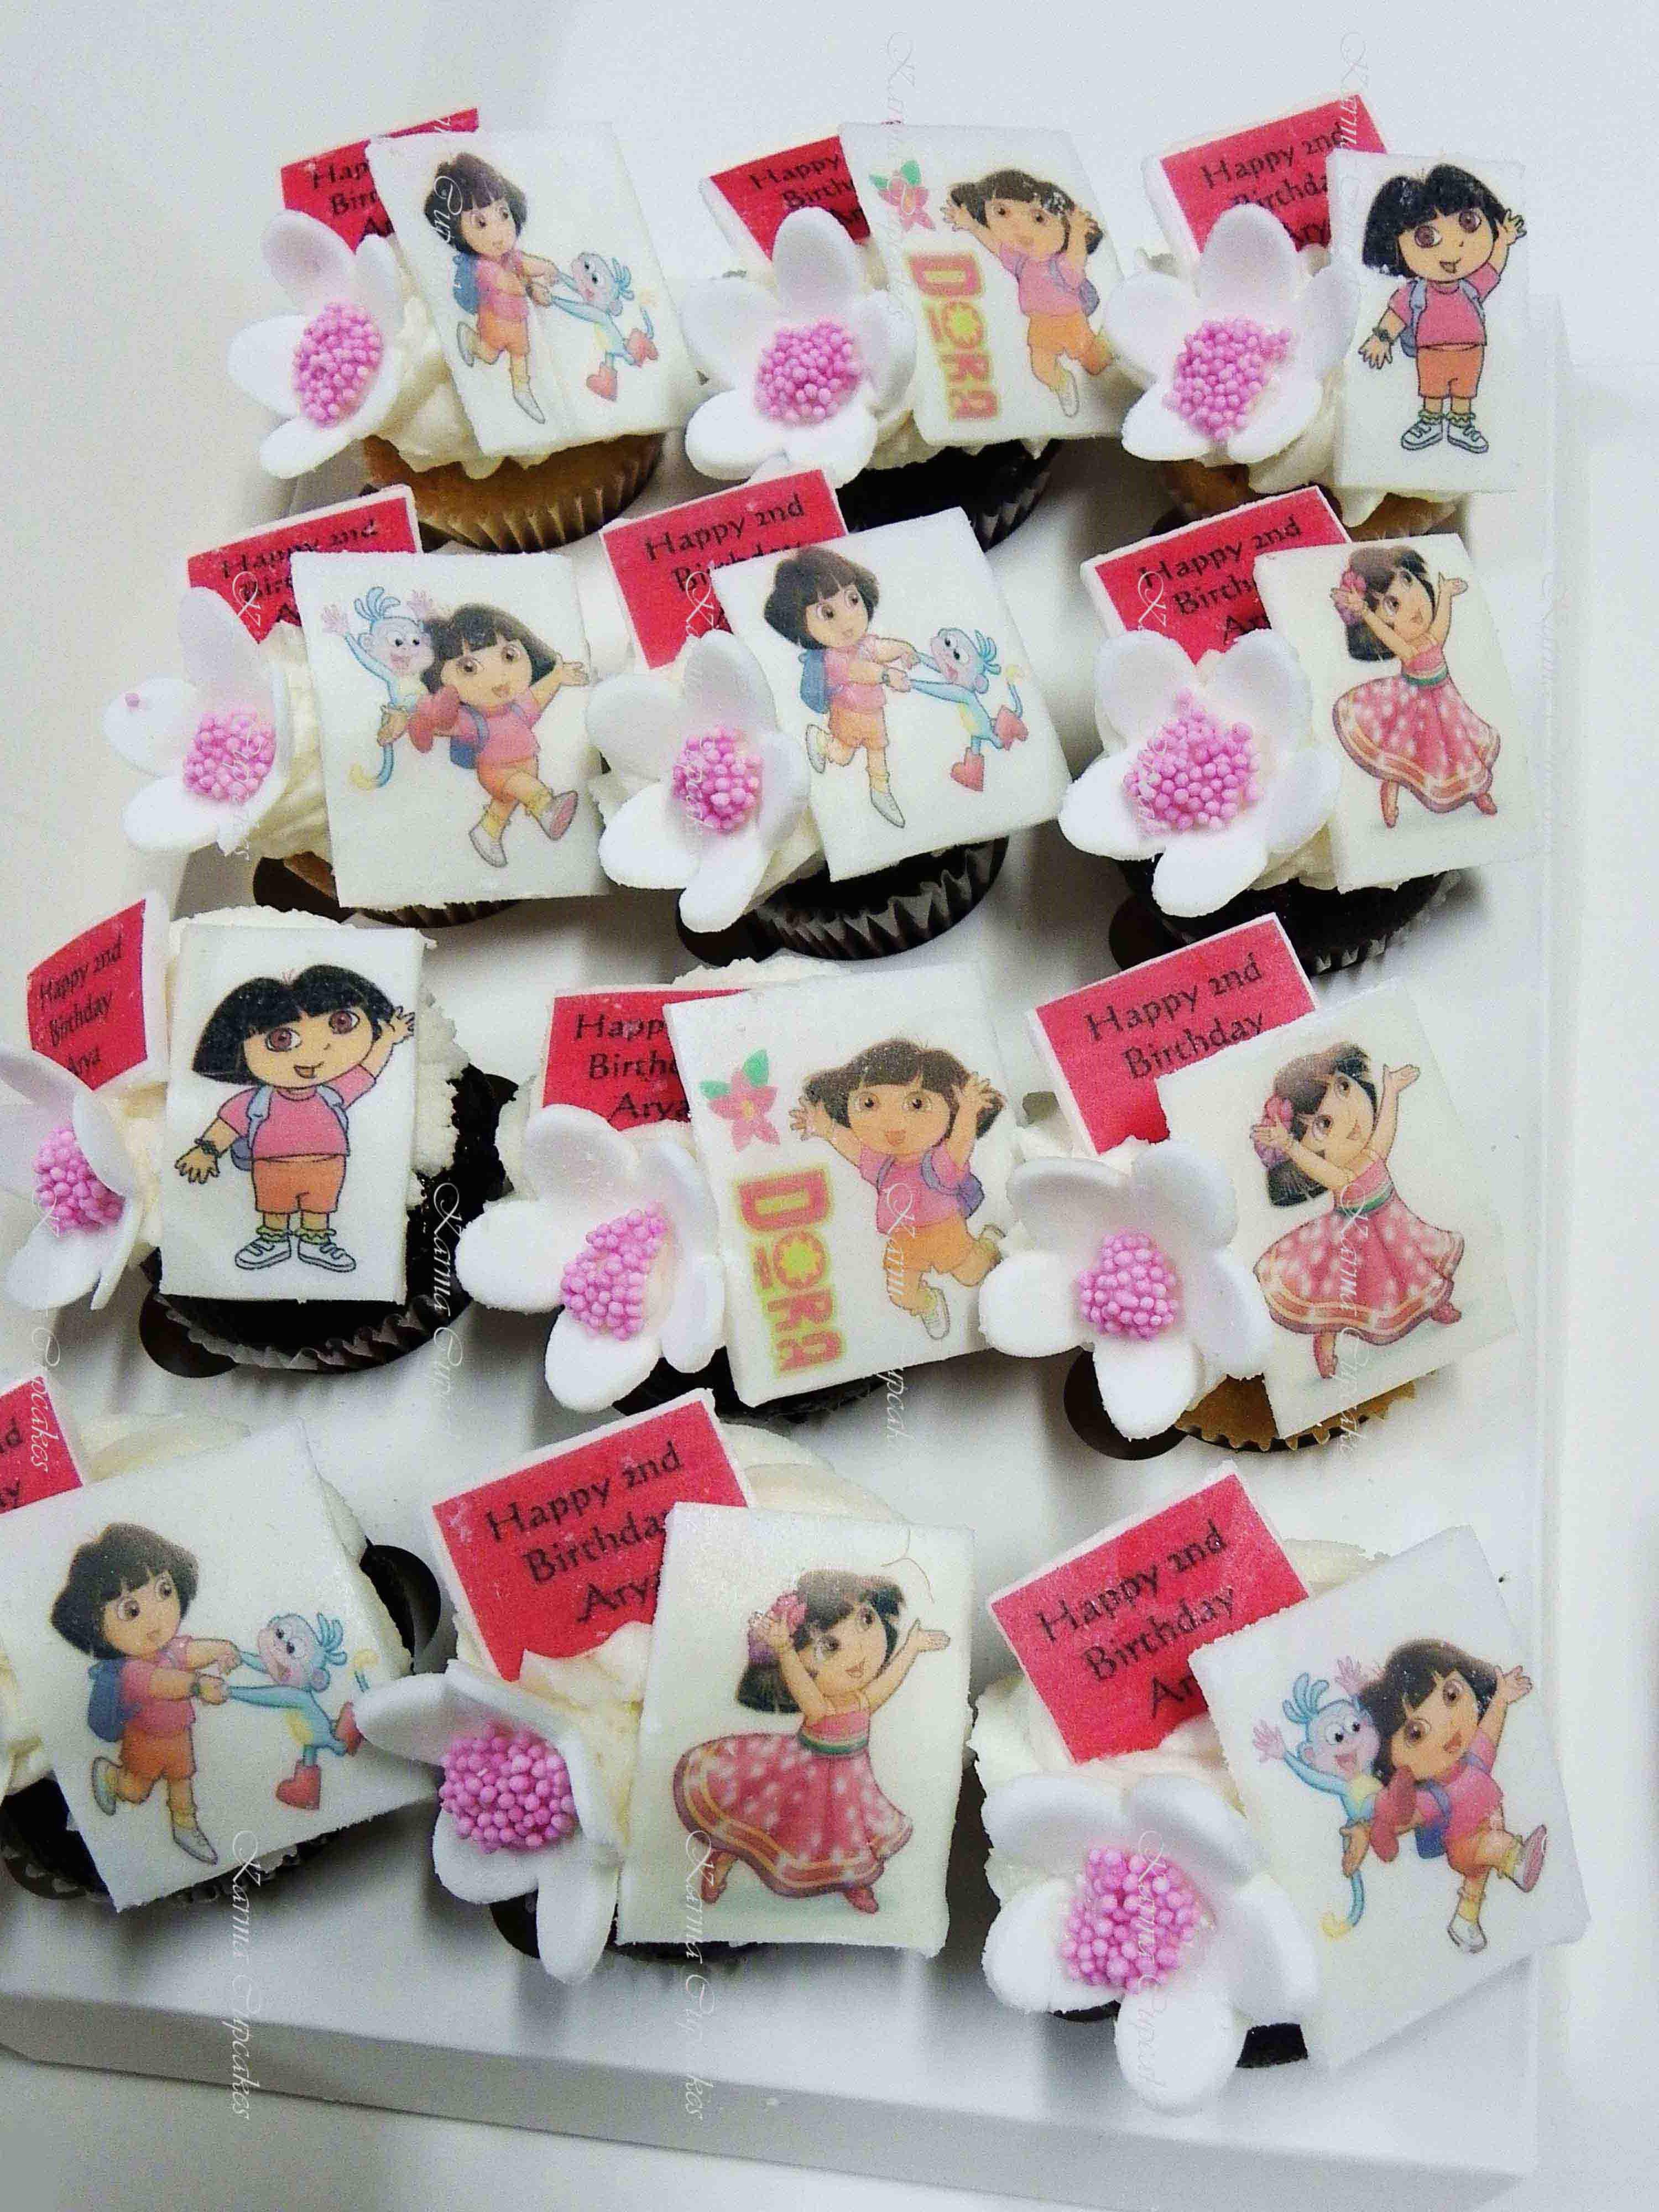 Dora the Explorer Mini Cupcakes